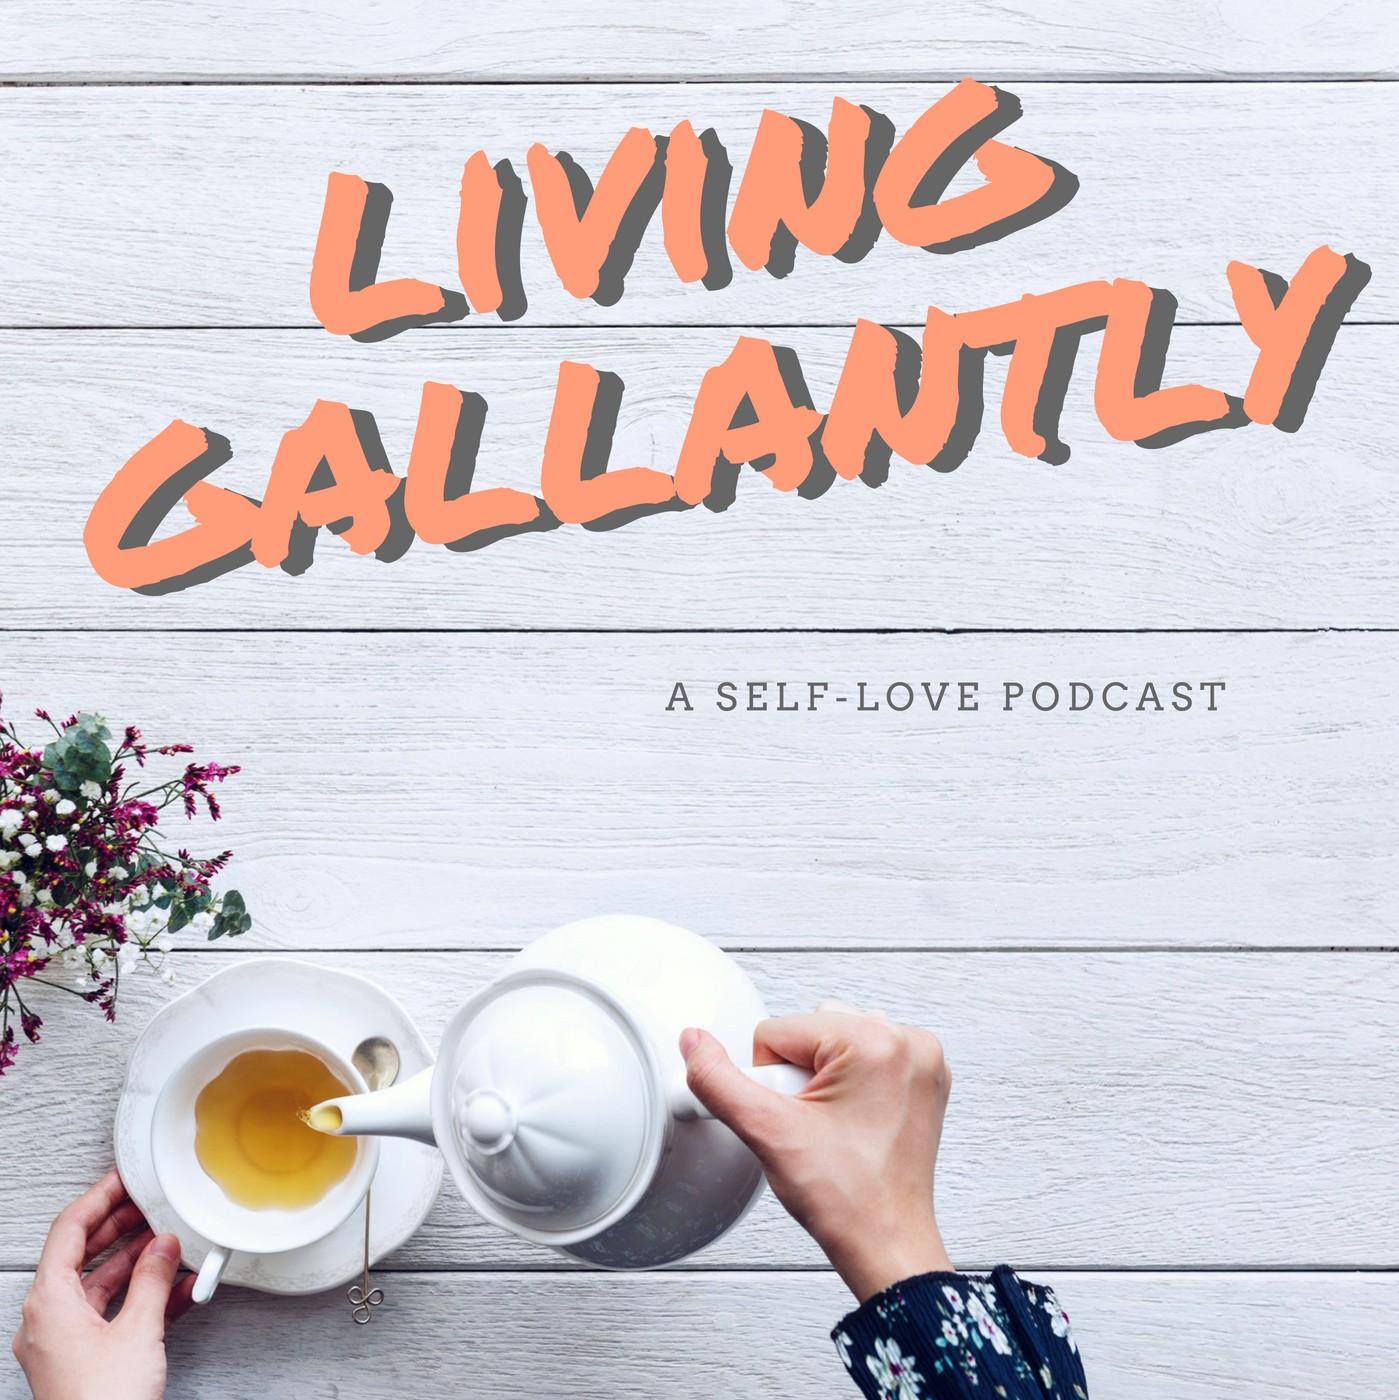 Living Gallantly 🌻